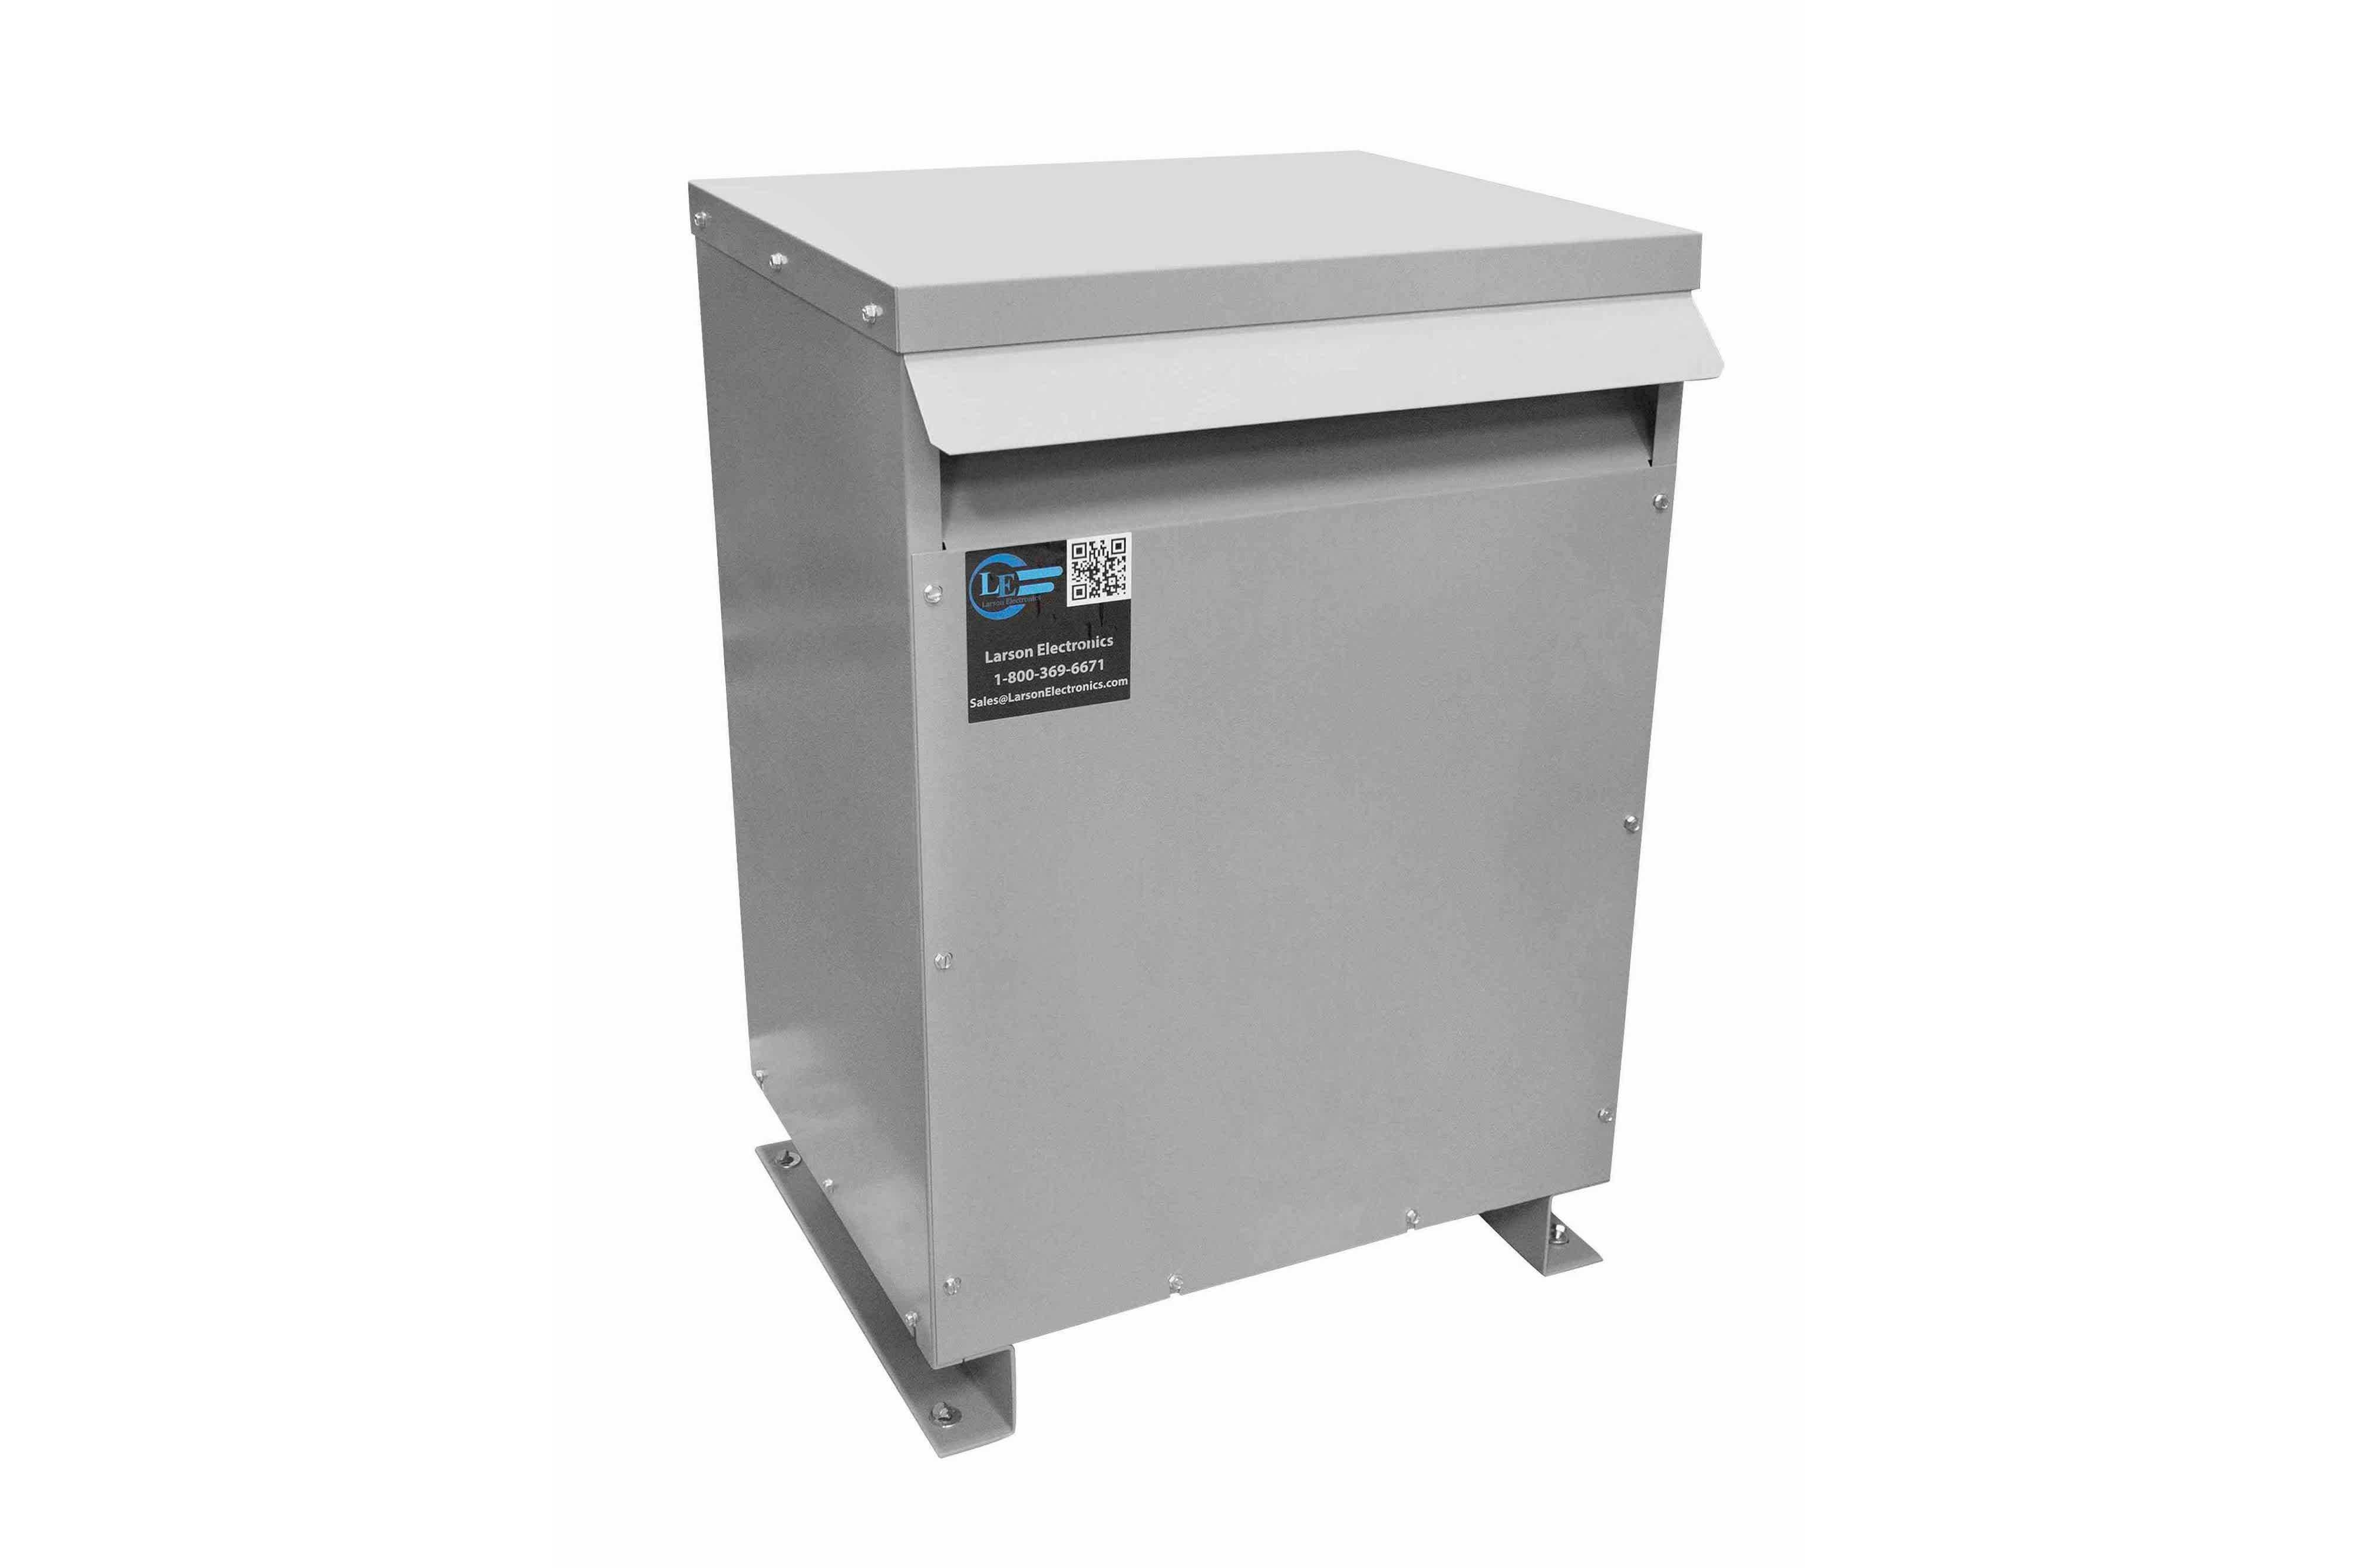 237.5 kVA 3PH Isolation Transformer, 460V Wye Primary, 415V Delta Secondary, N3R, Ventilated, 60 Hz